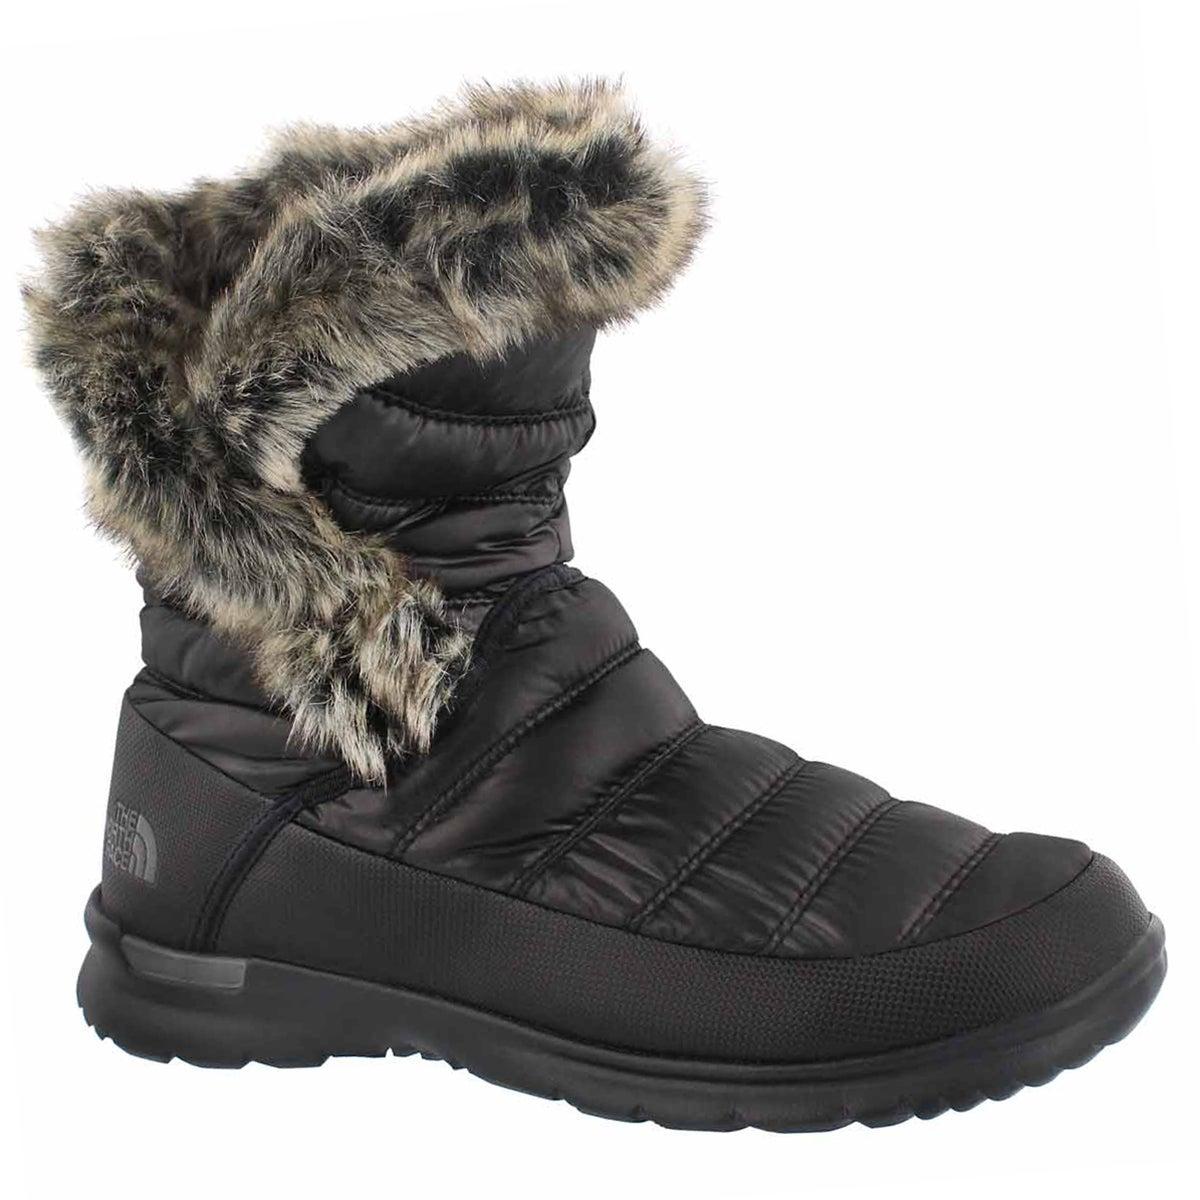 Women's THERMO MICRO-BAFFLE II winter boots